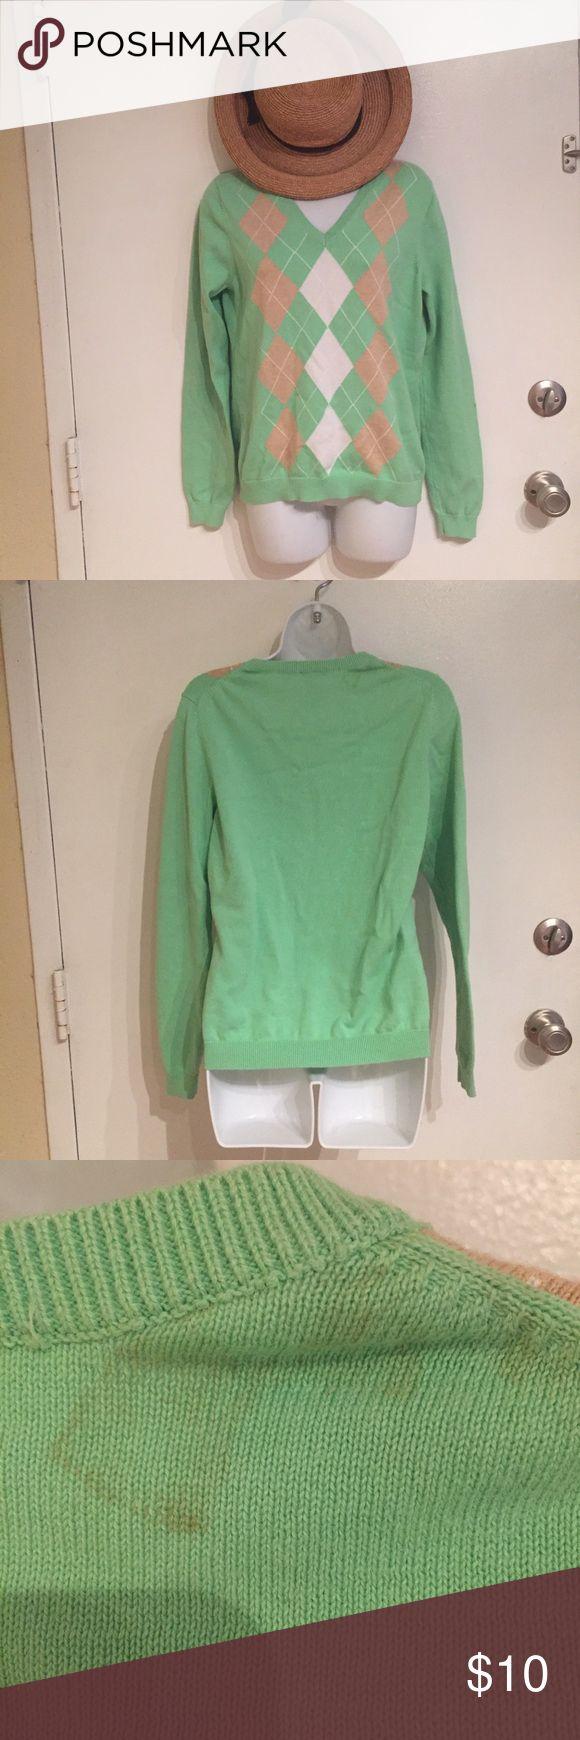 Classic Izod Argyle V Neck Sweater Classic Izod v neck argyle sweater. Size medium. Does have a stain on the back near the collar.  #classic #izod #vneck #argyle #sweater #medium #punkydoodle  No modeling Smoke and pet free home I do discount bundles Izod Sweaters V-Necks